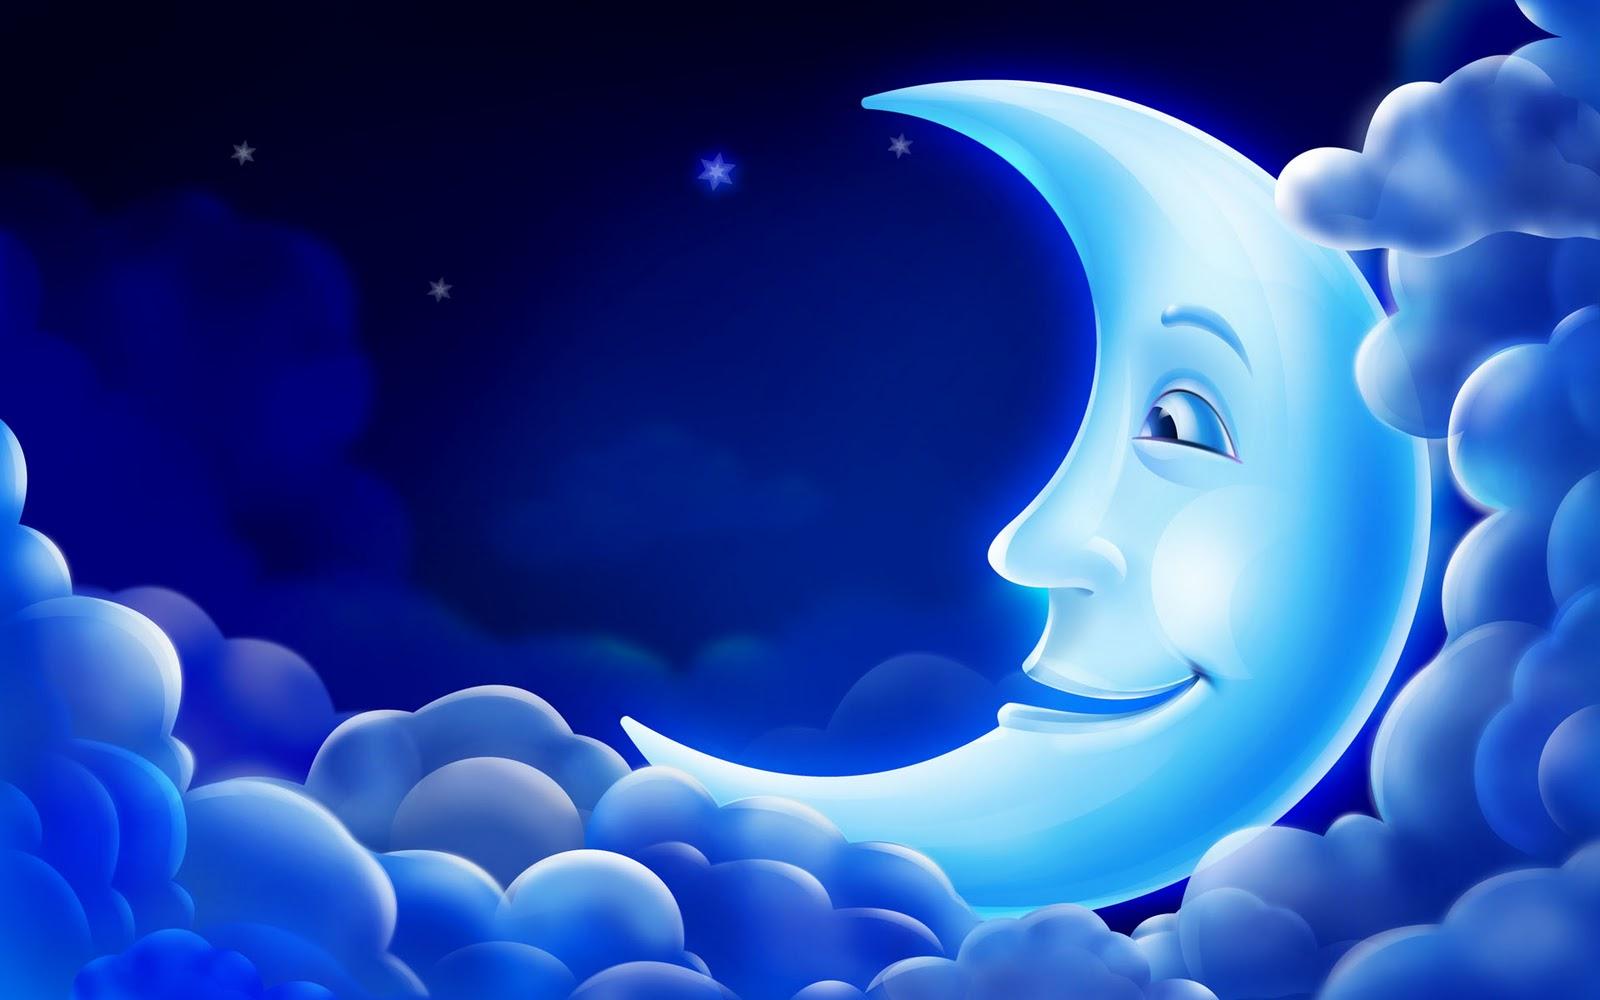 Smiles Blue Moon 3d Digital Art